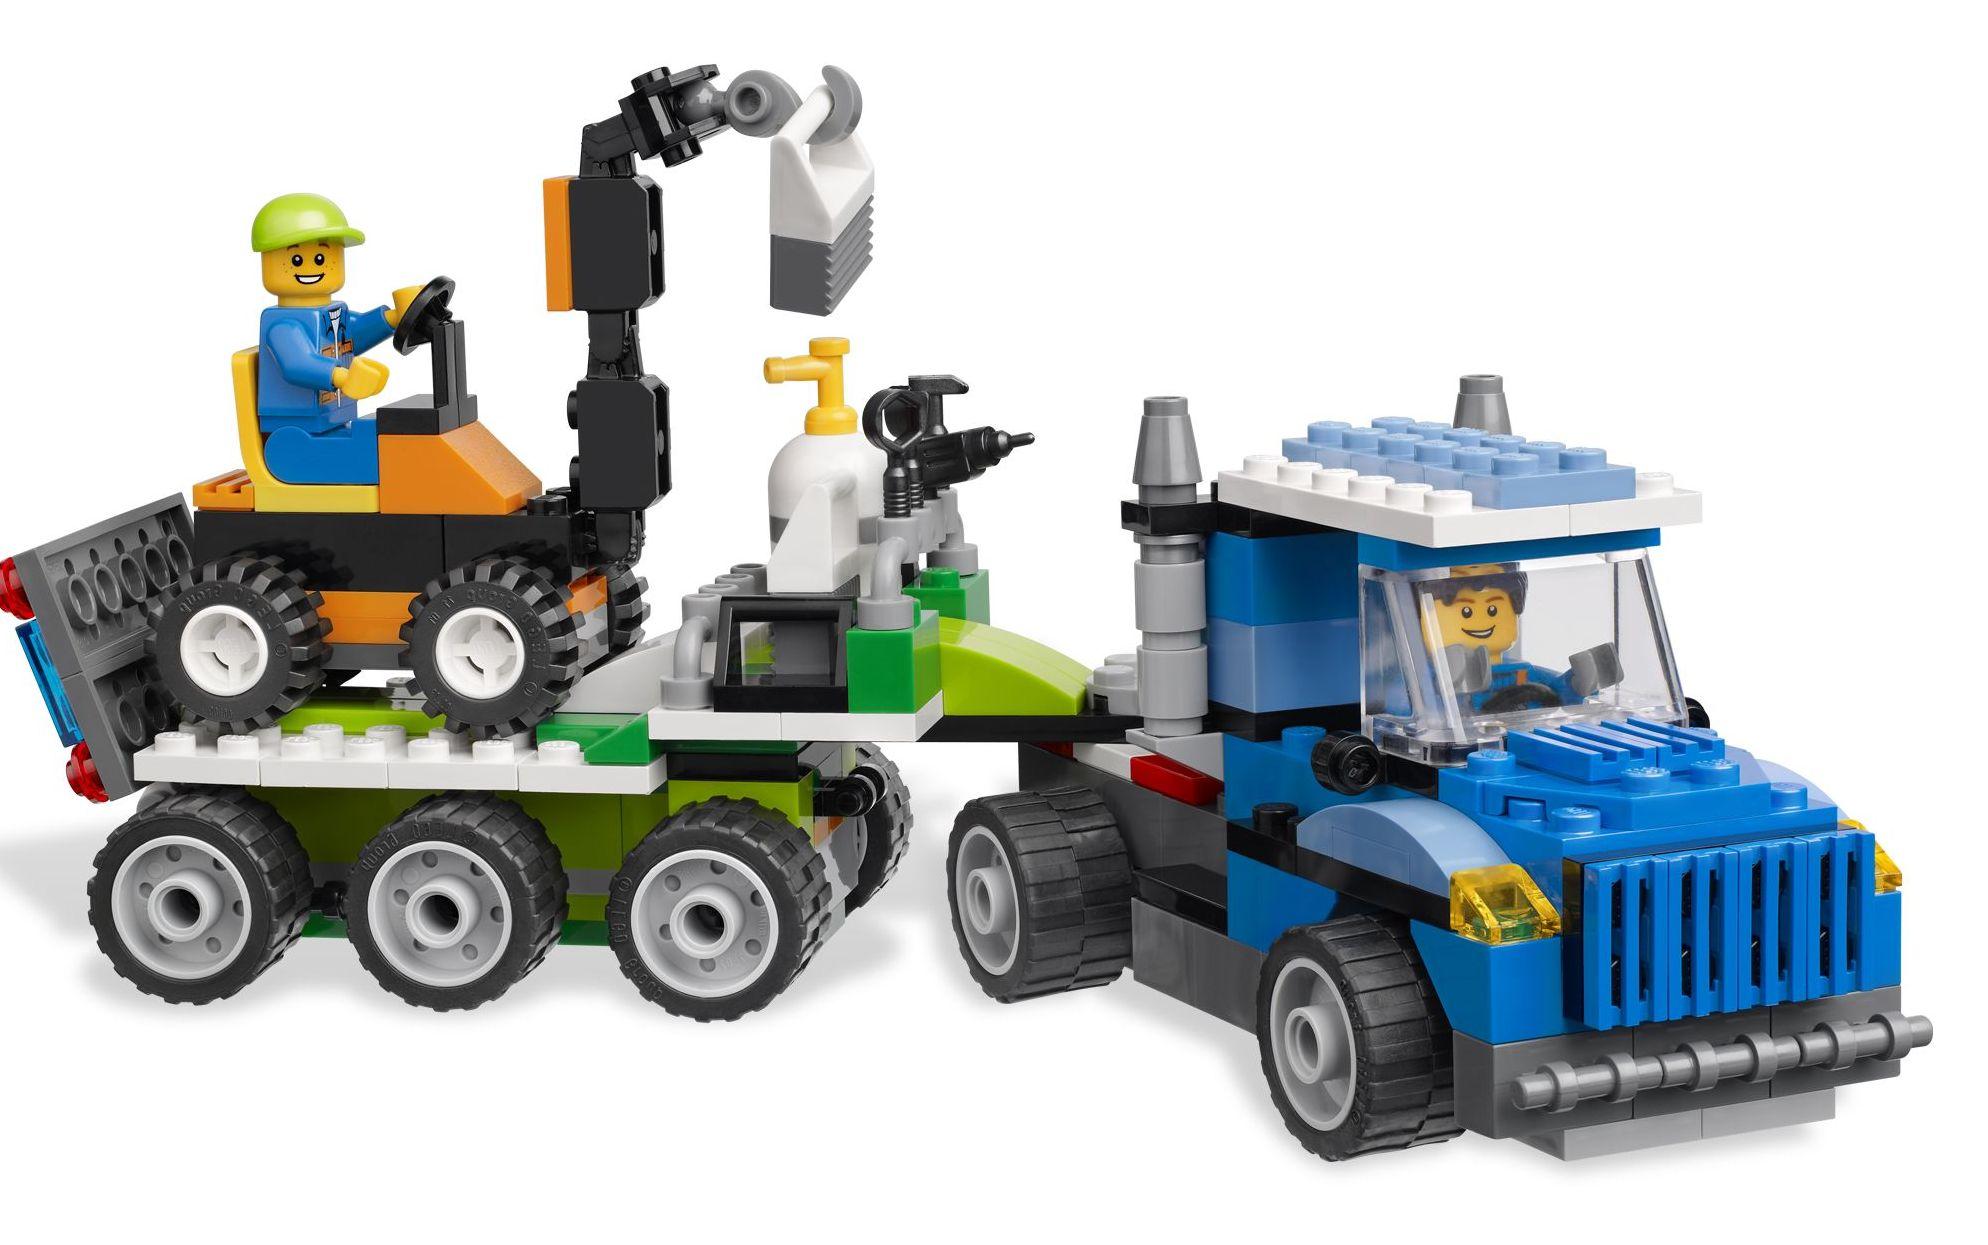 Lego 4635 Fun With Vehicles I Brick City